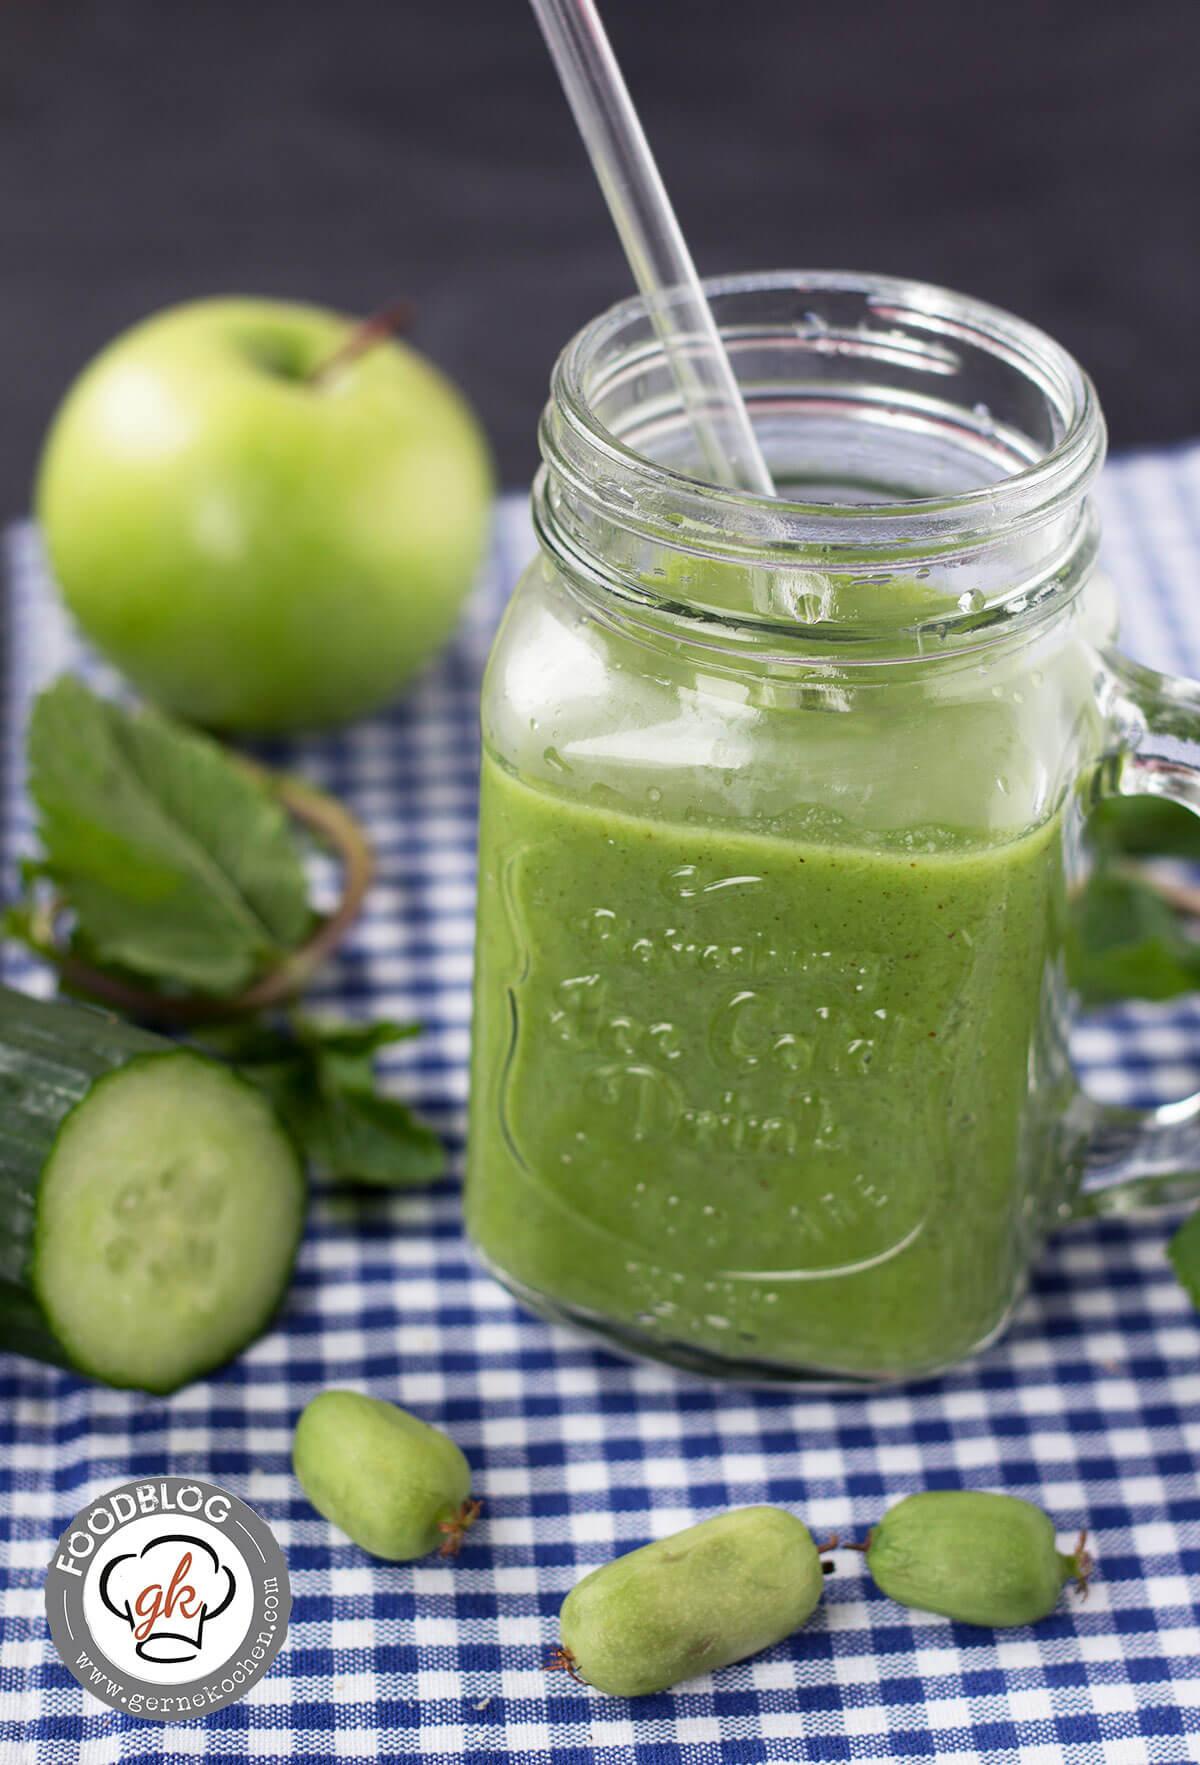 Geballte Power in Grün: Apfel-Gurke-Kiwibeeren Smoothie